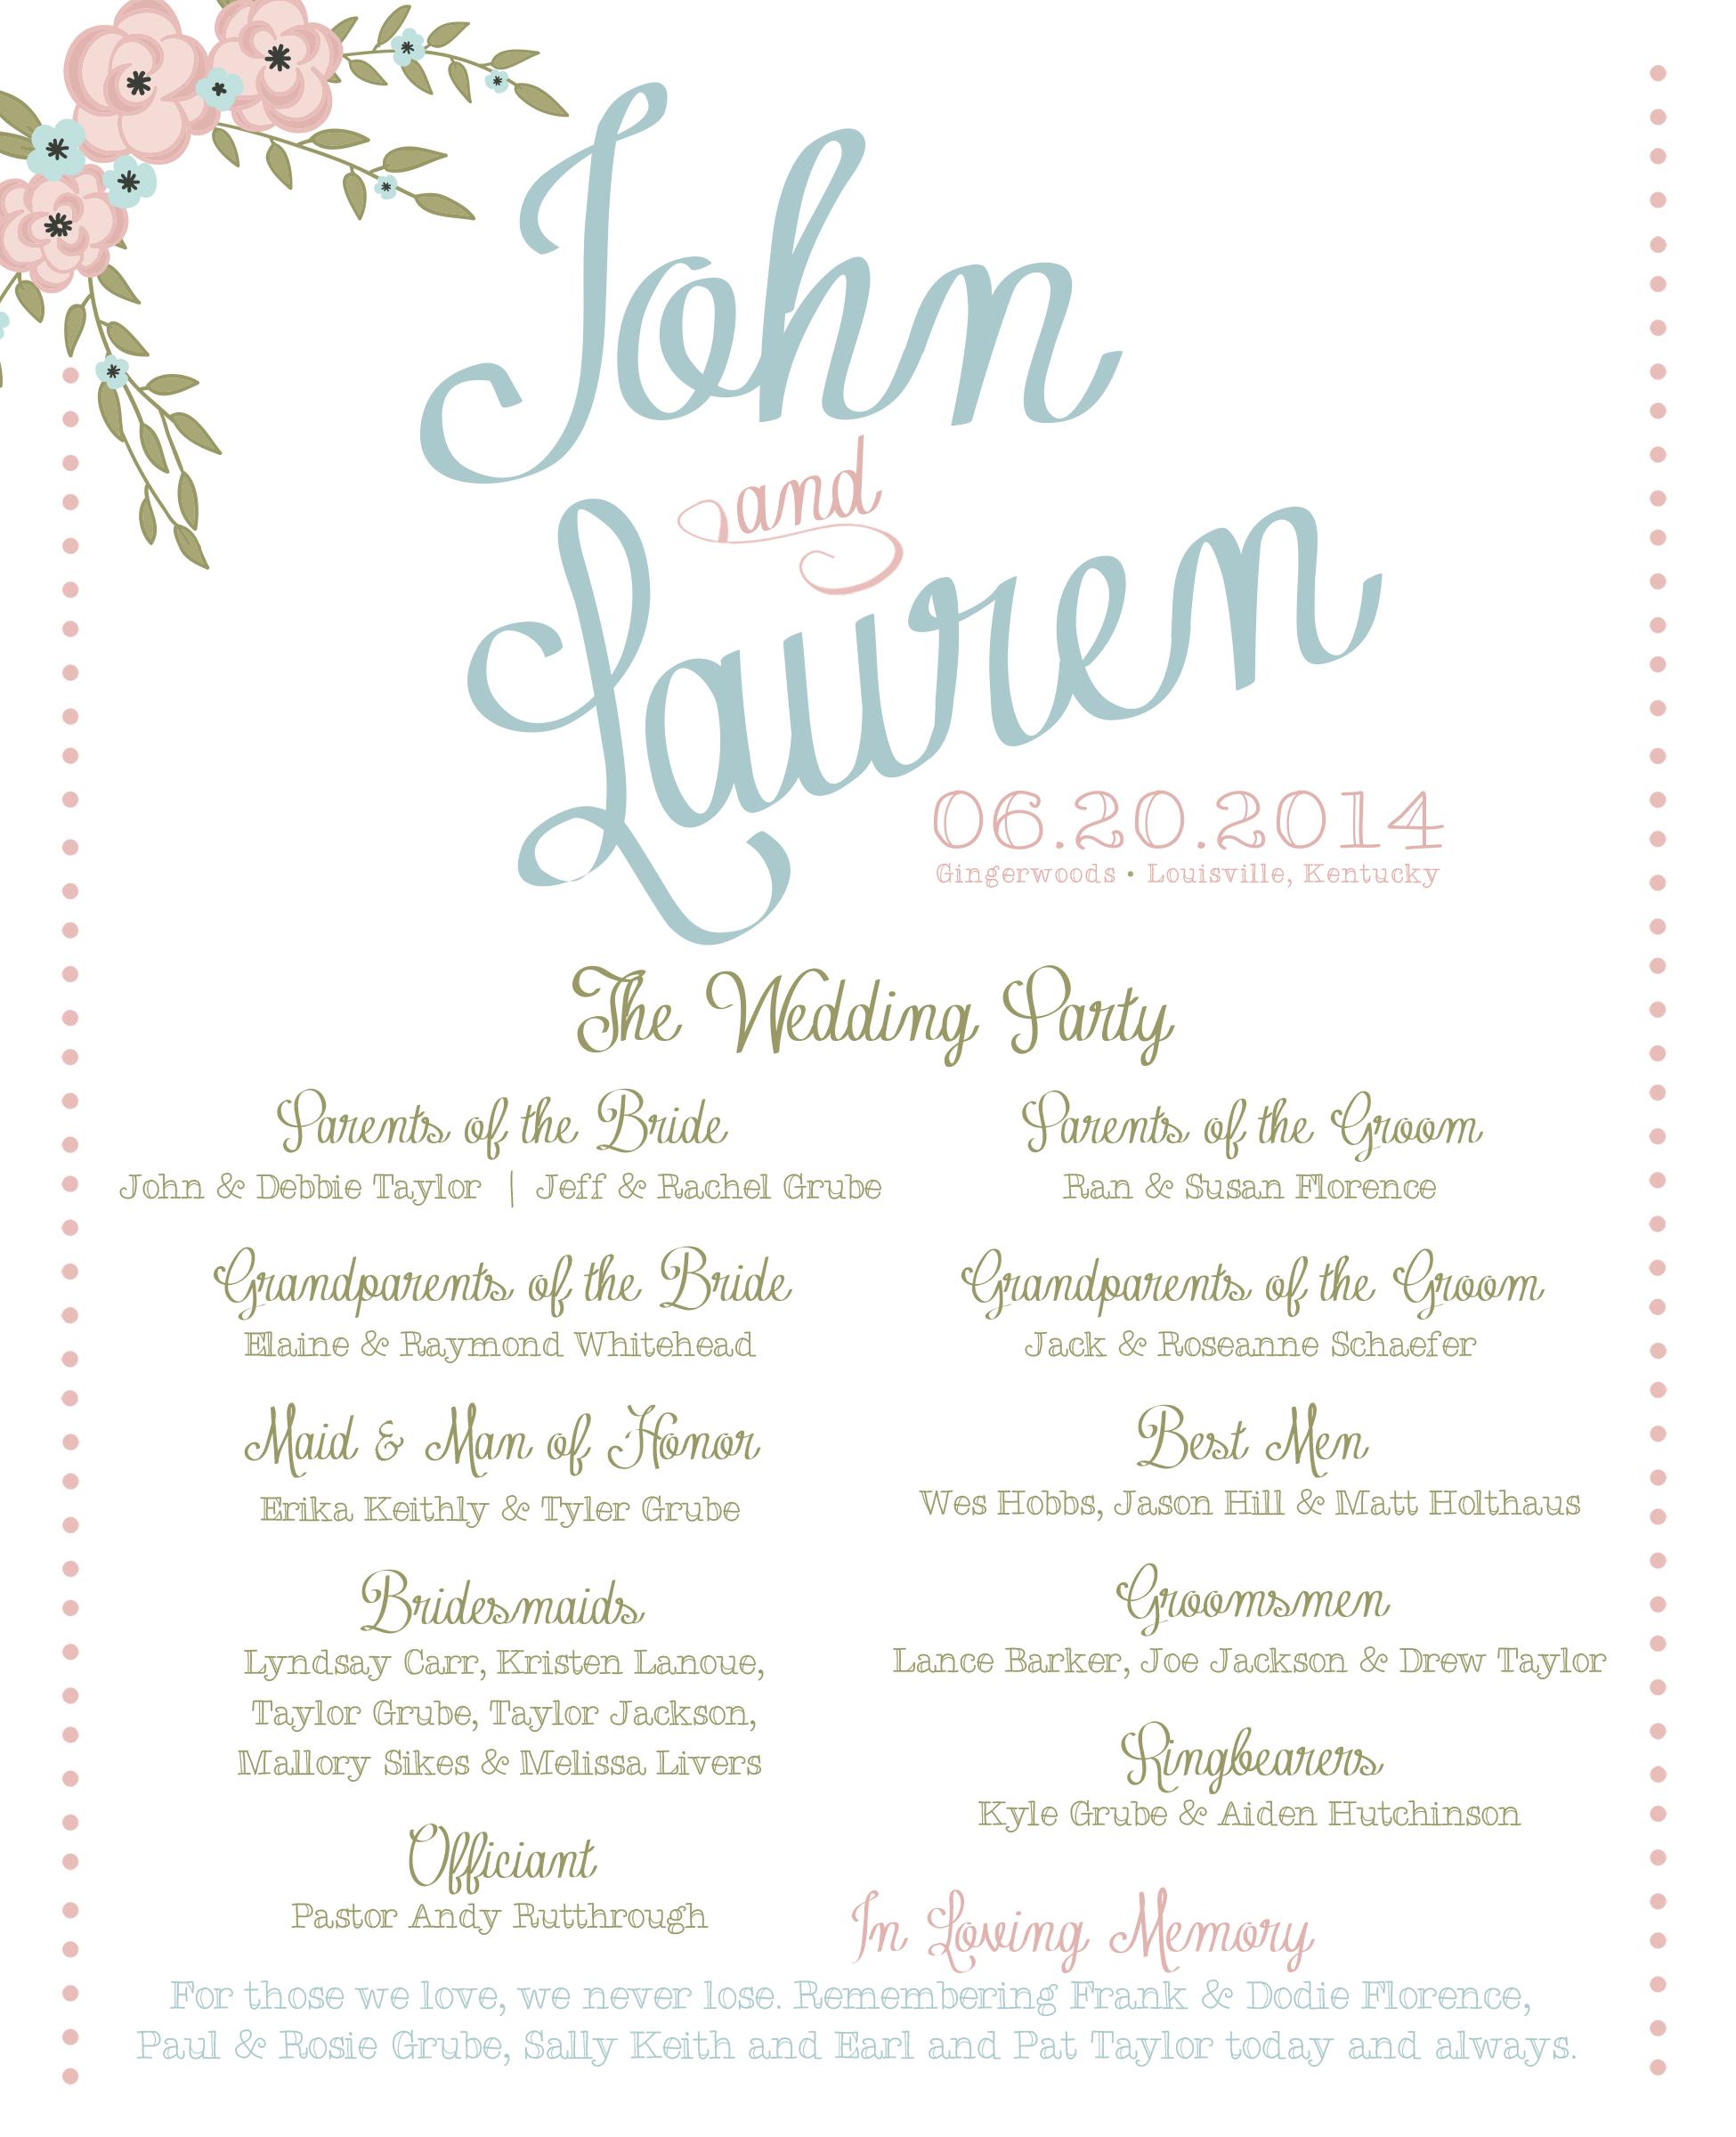 LJ_Program Ceremony_wedding party side.jpg